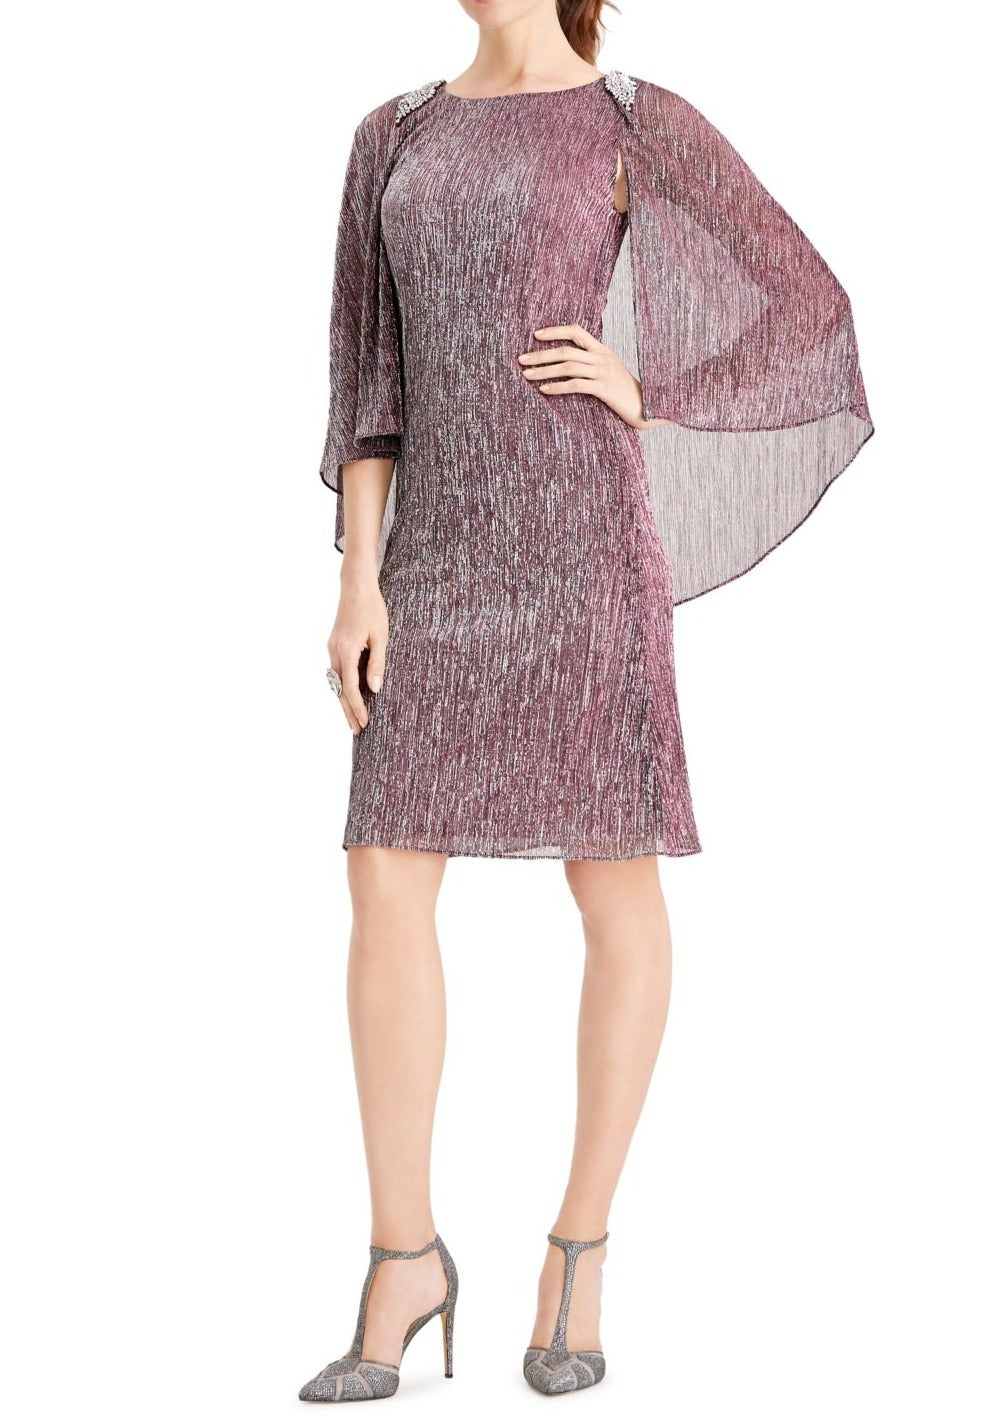 SLNY Womens Dress Purple Size 12 Sheath Metallic Stripe Bling Shoulder